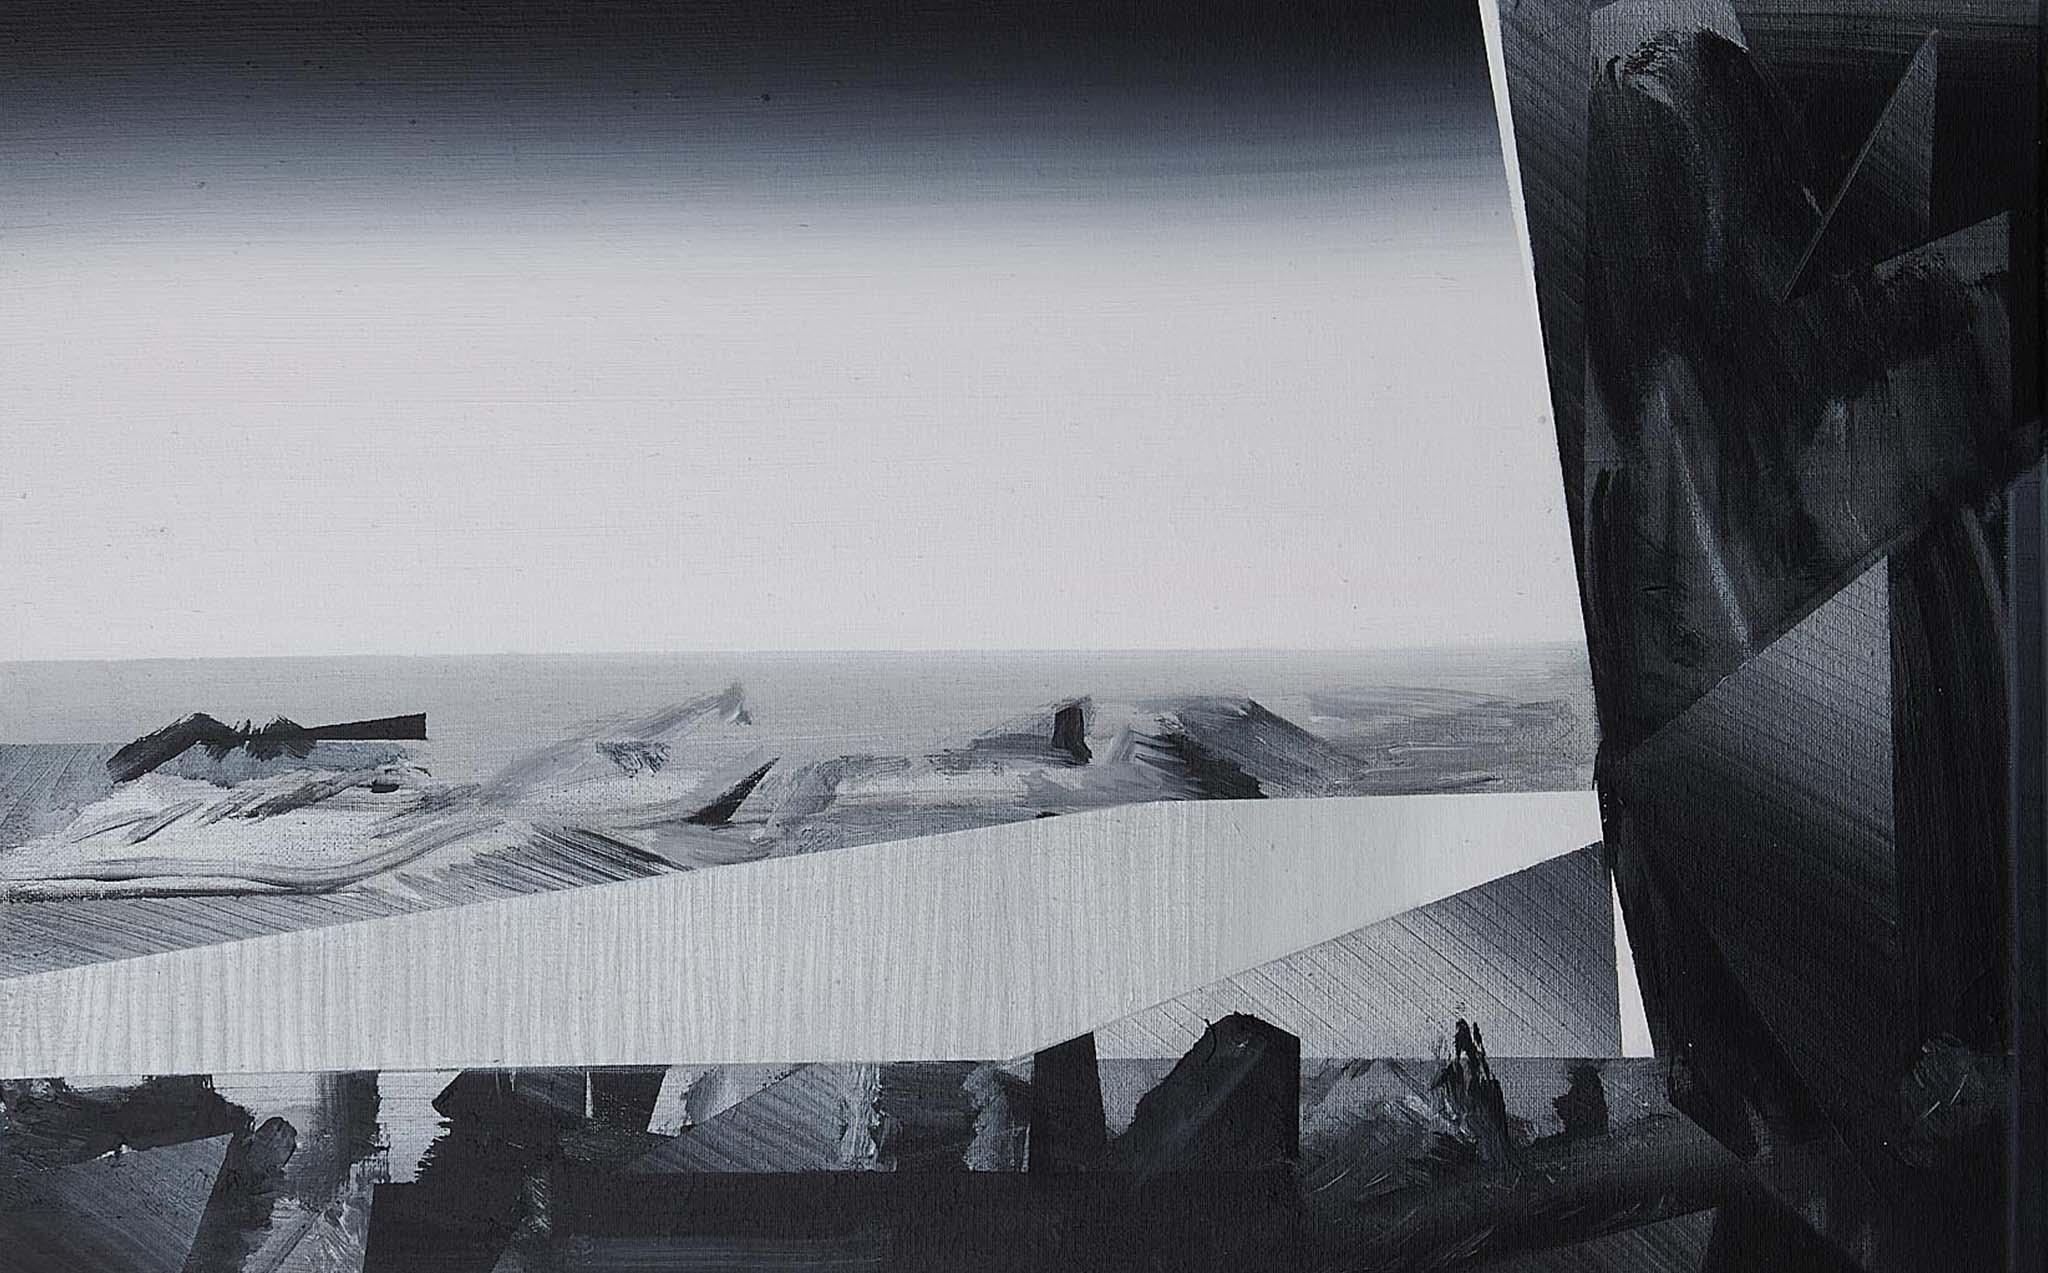 Phil Ashcroft, Tunnels Beaches 1 (Ilfracombe), acrylic on canvas, 61 x 46cm, 2020